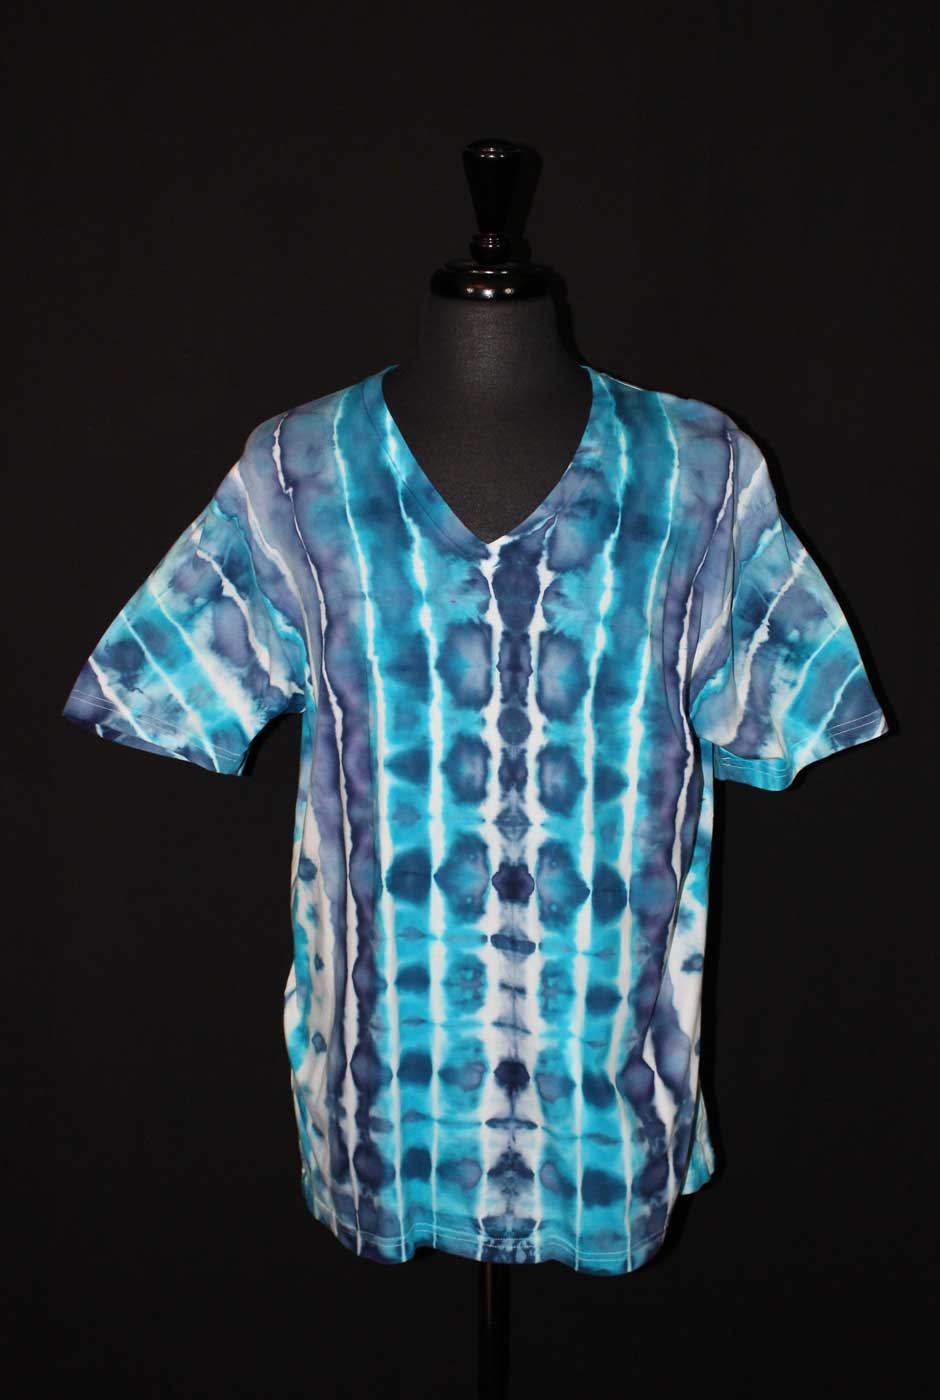 Prods Hues Of Blues Organic T Shirt Fp